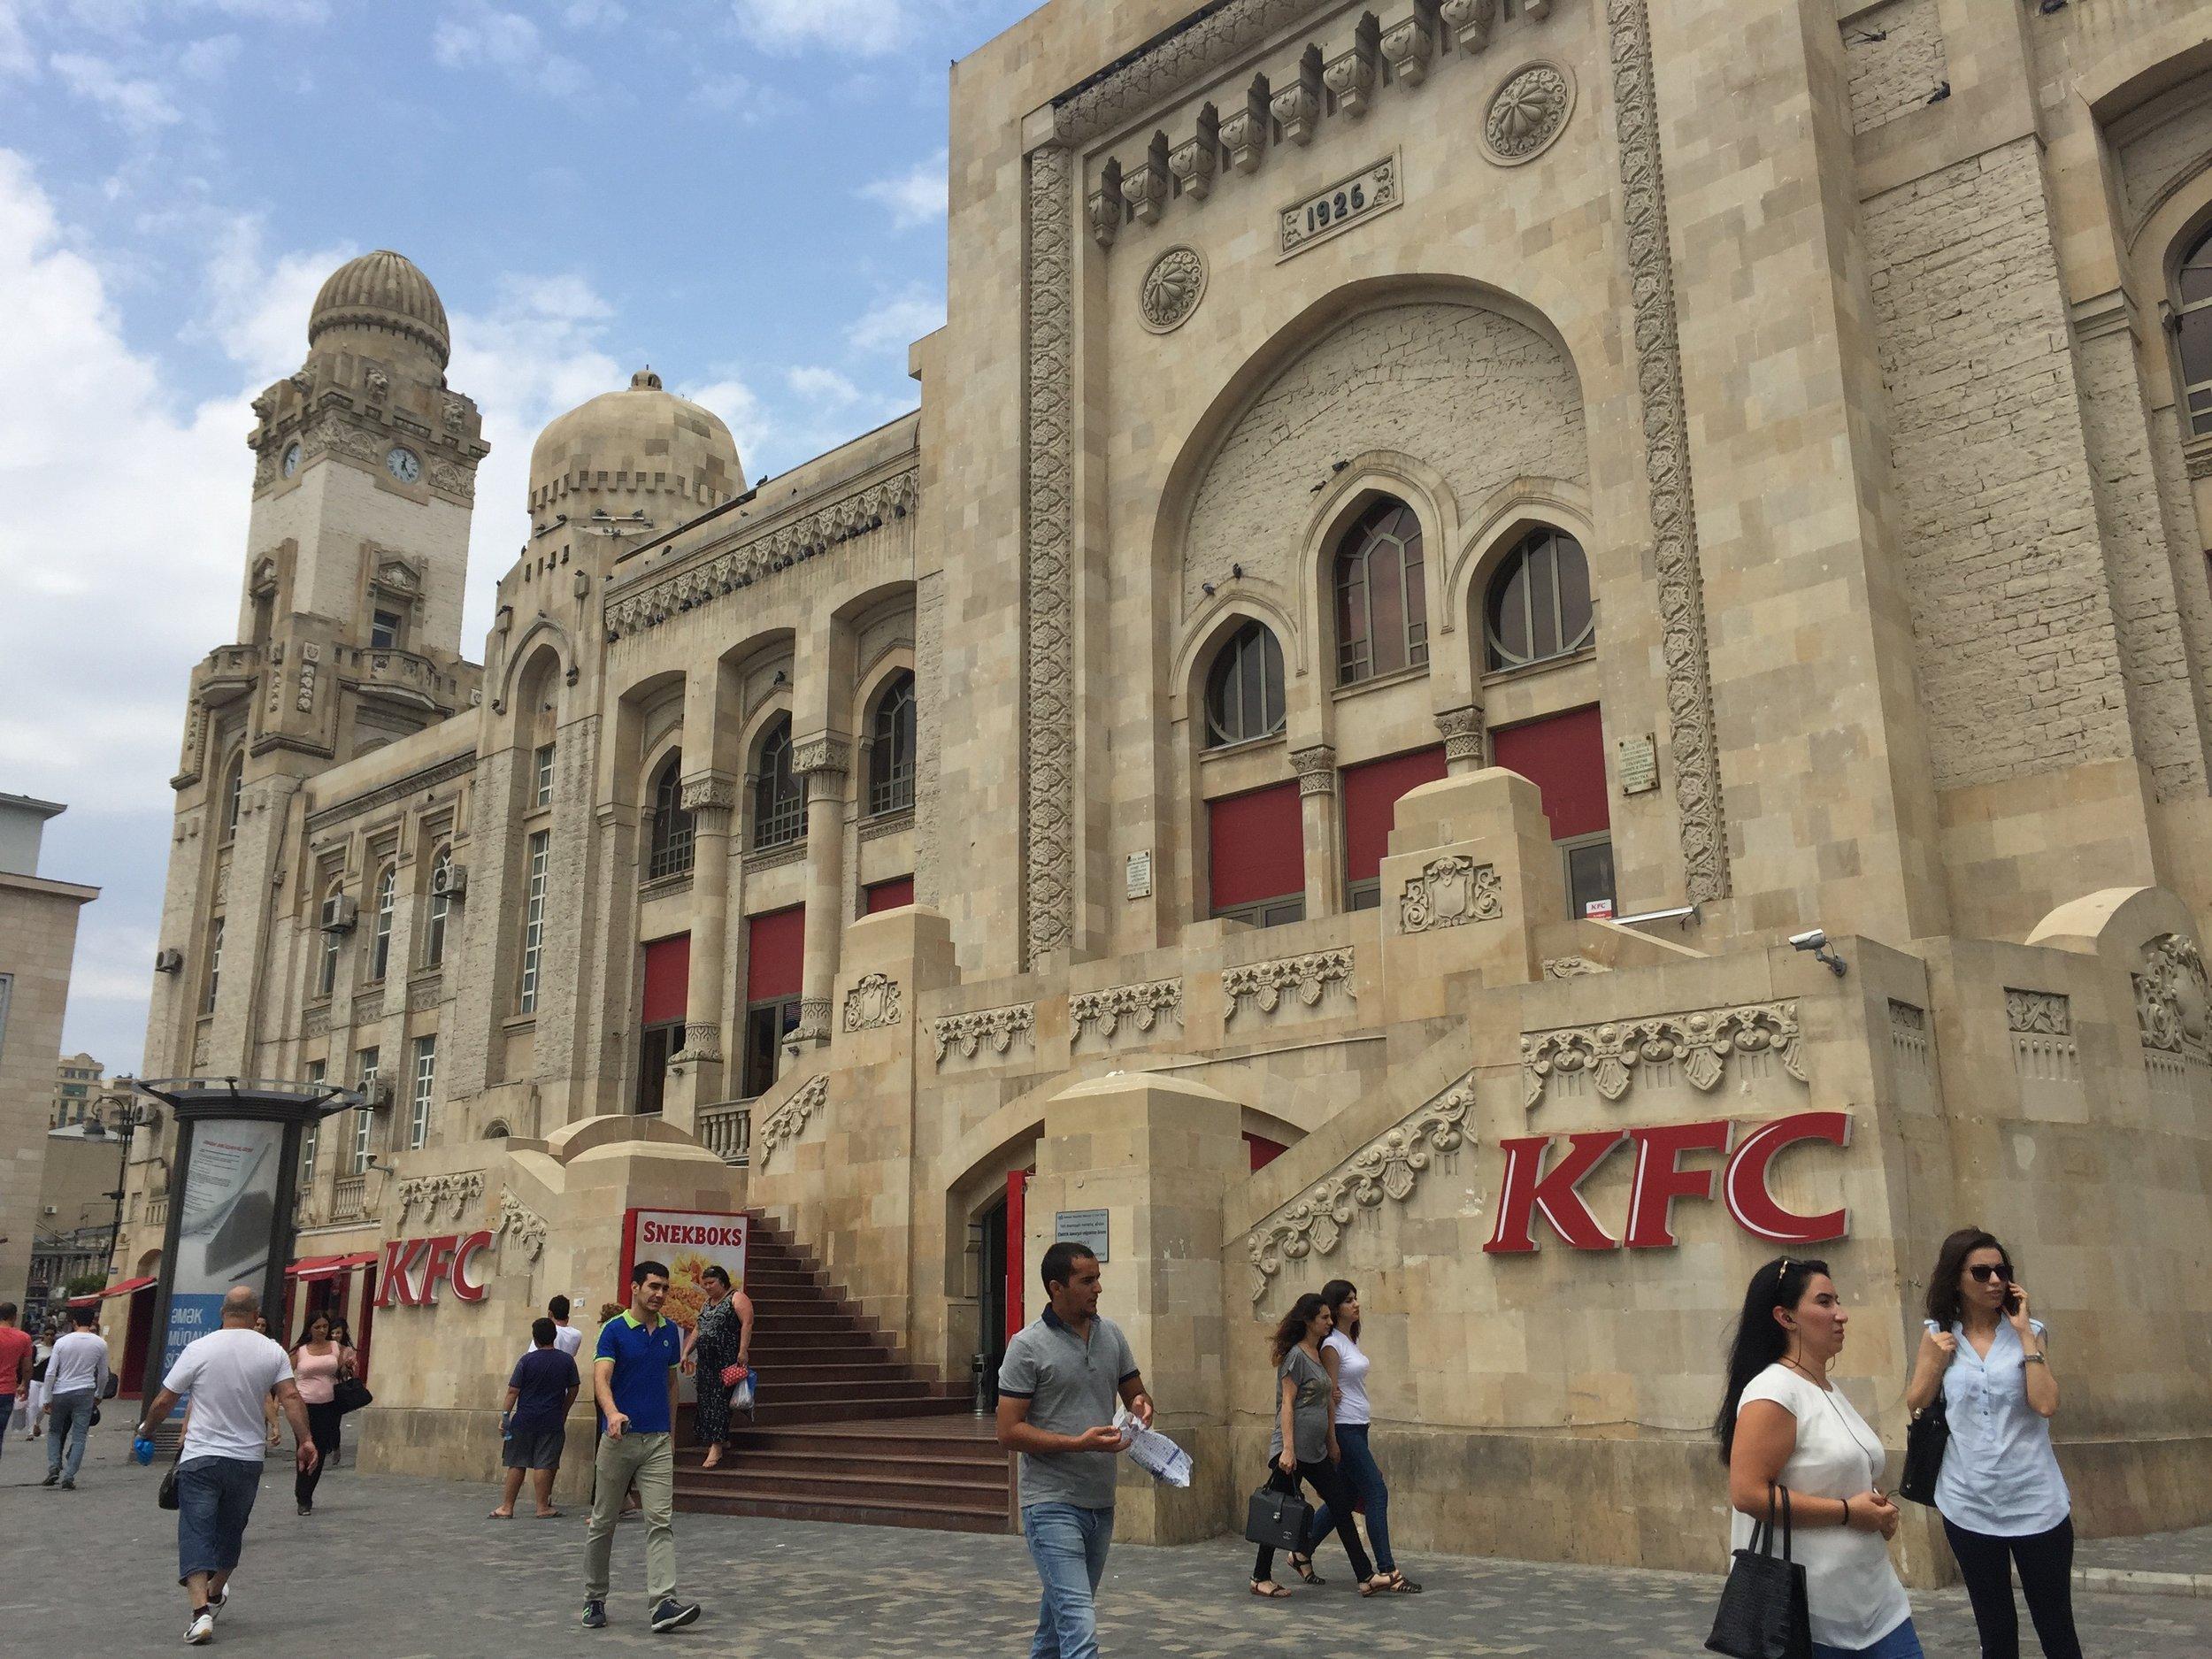 Le plus grand Kentucky du monde, le KFC Palace de Baku en Azerbaïdjan.